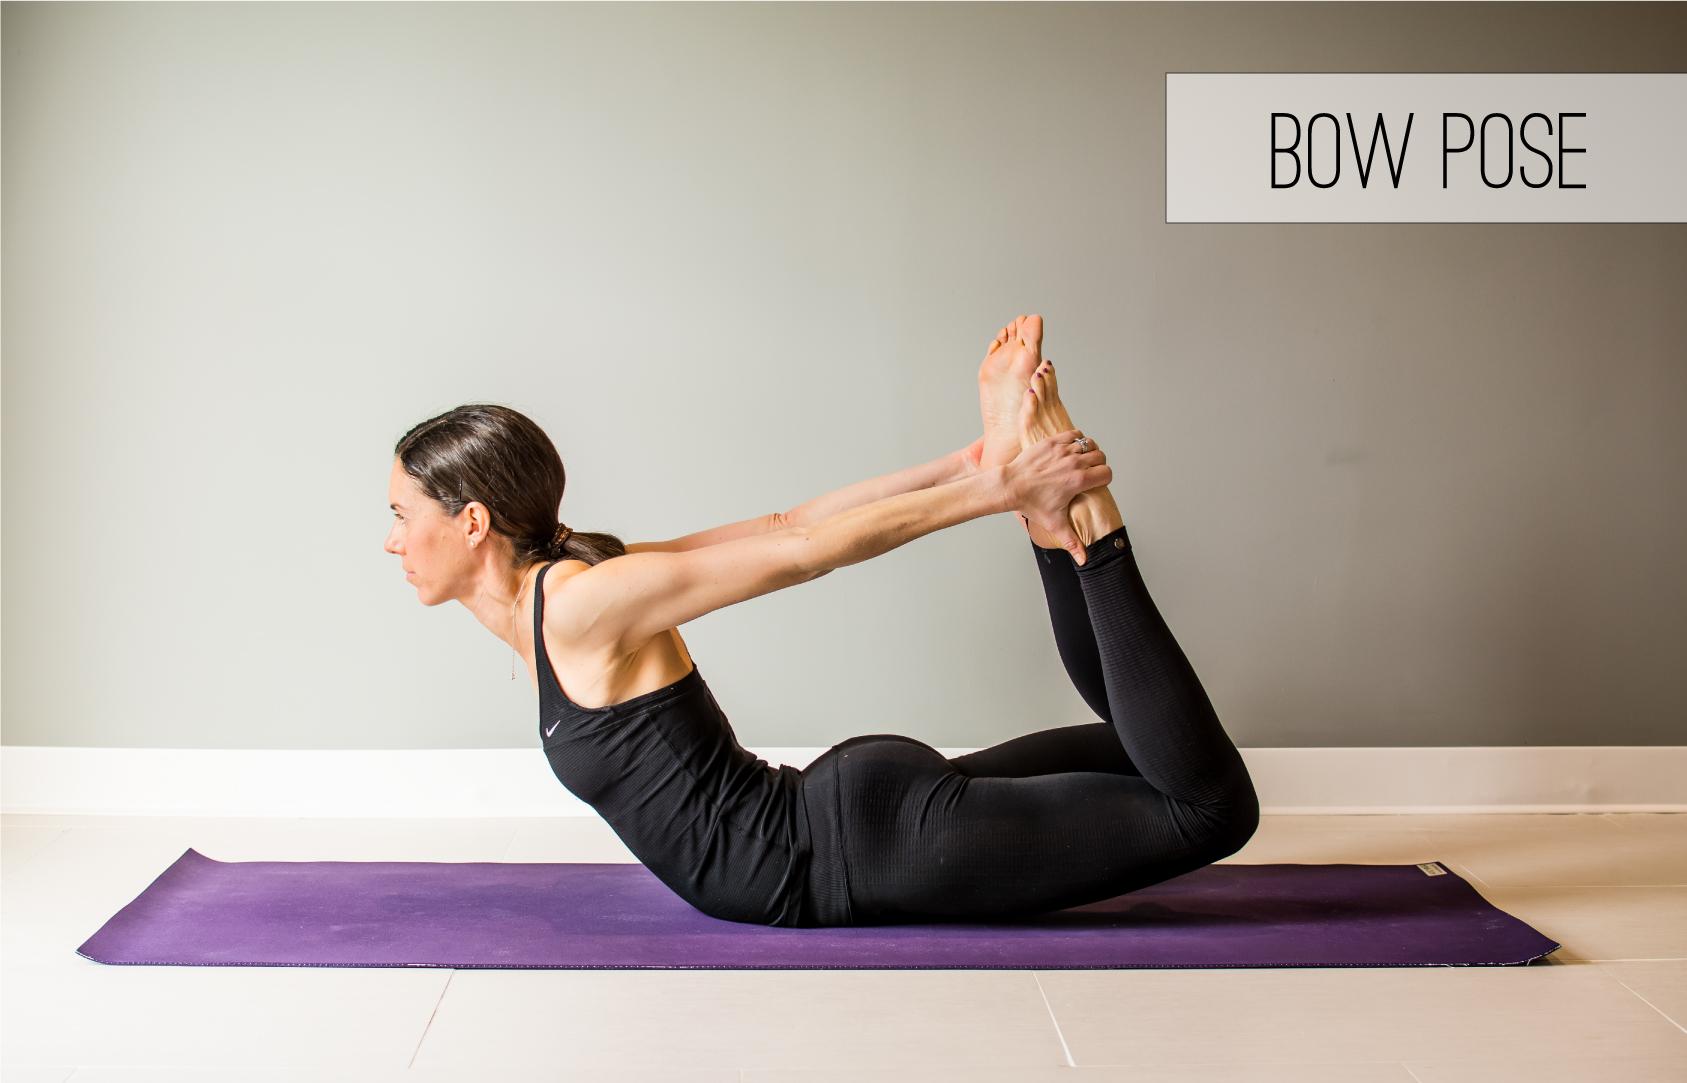 Yoga Series - #2 - Bow Pose | The Holistic Grail